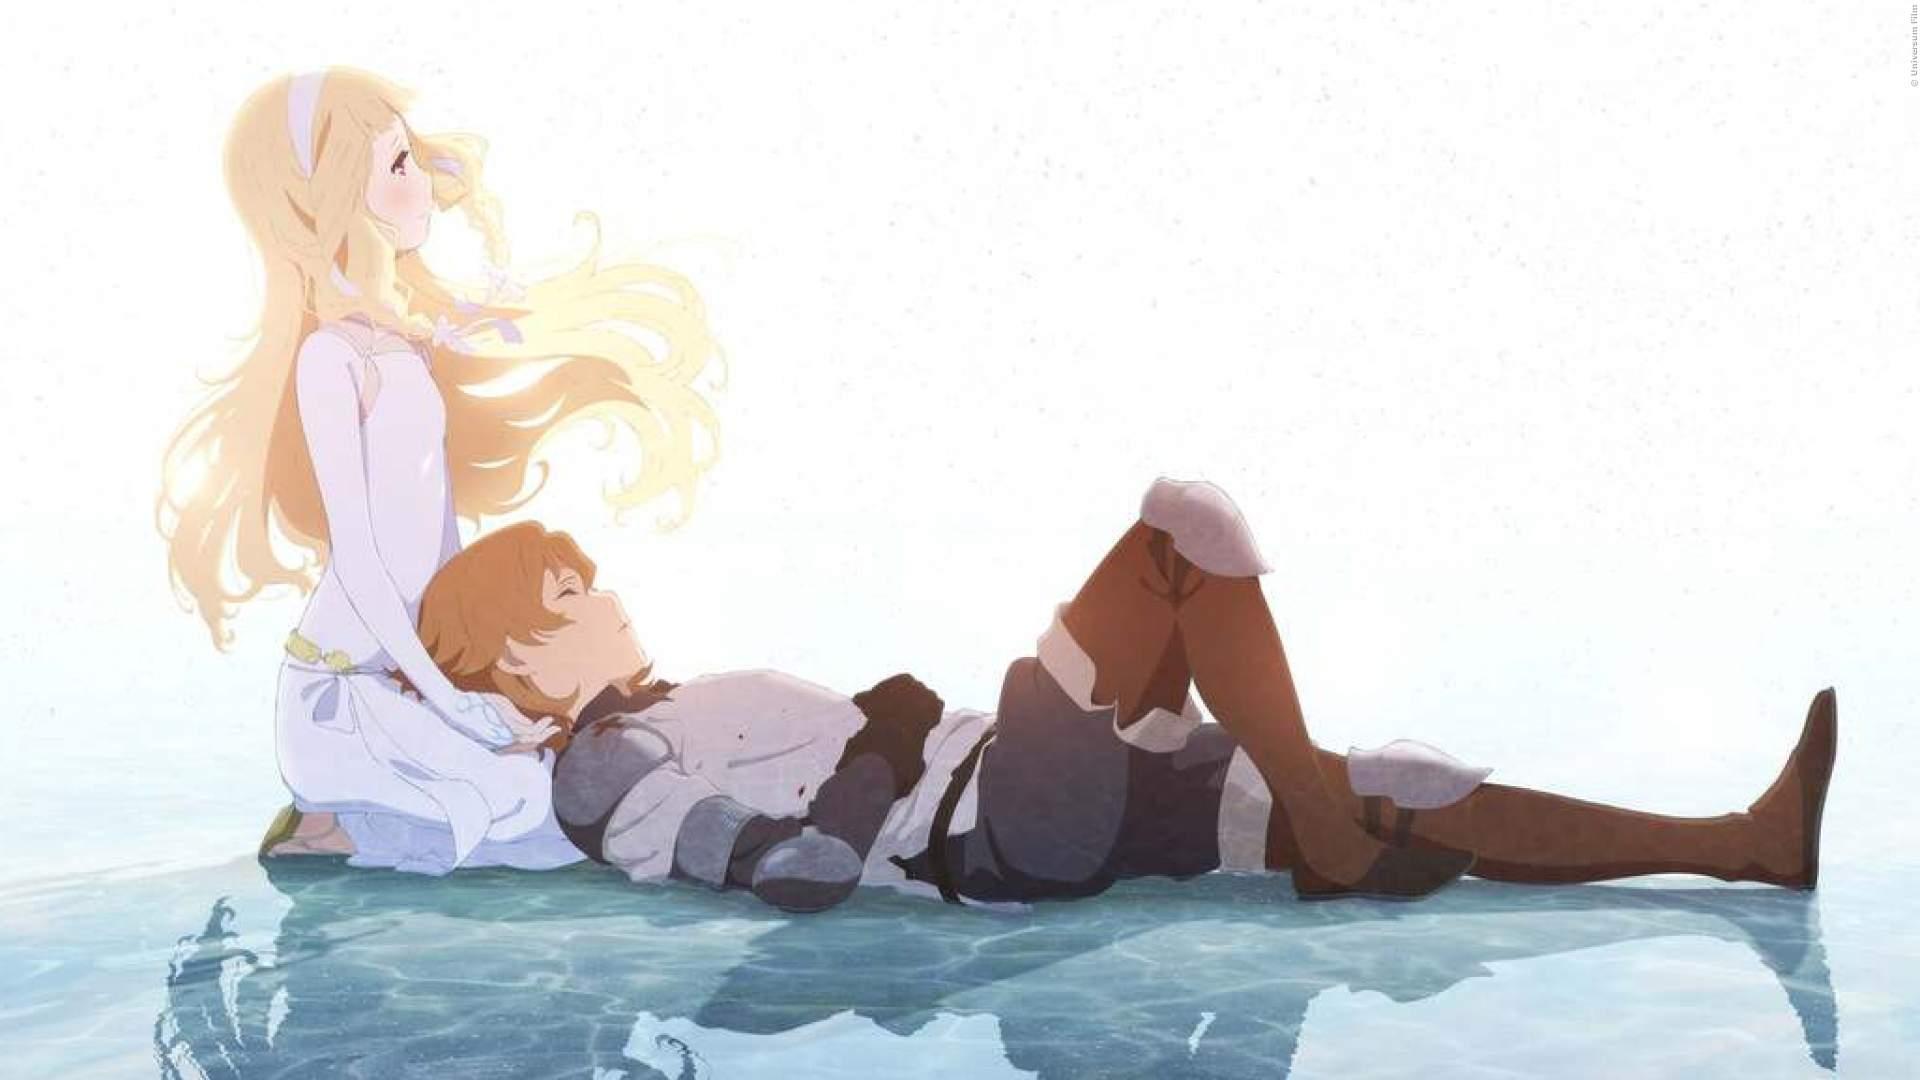 MAQUIA: Exklusiver Ausschnitt aus dem Kino-Anime